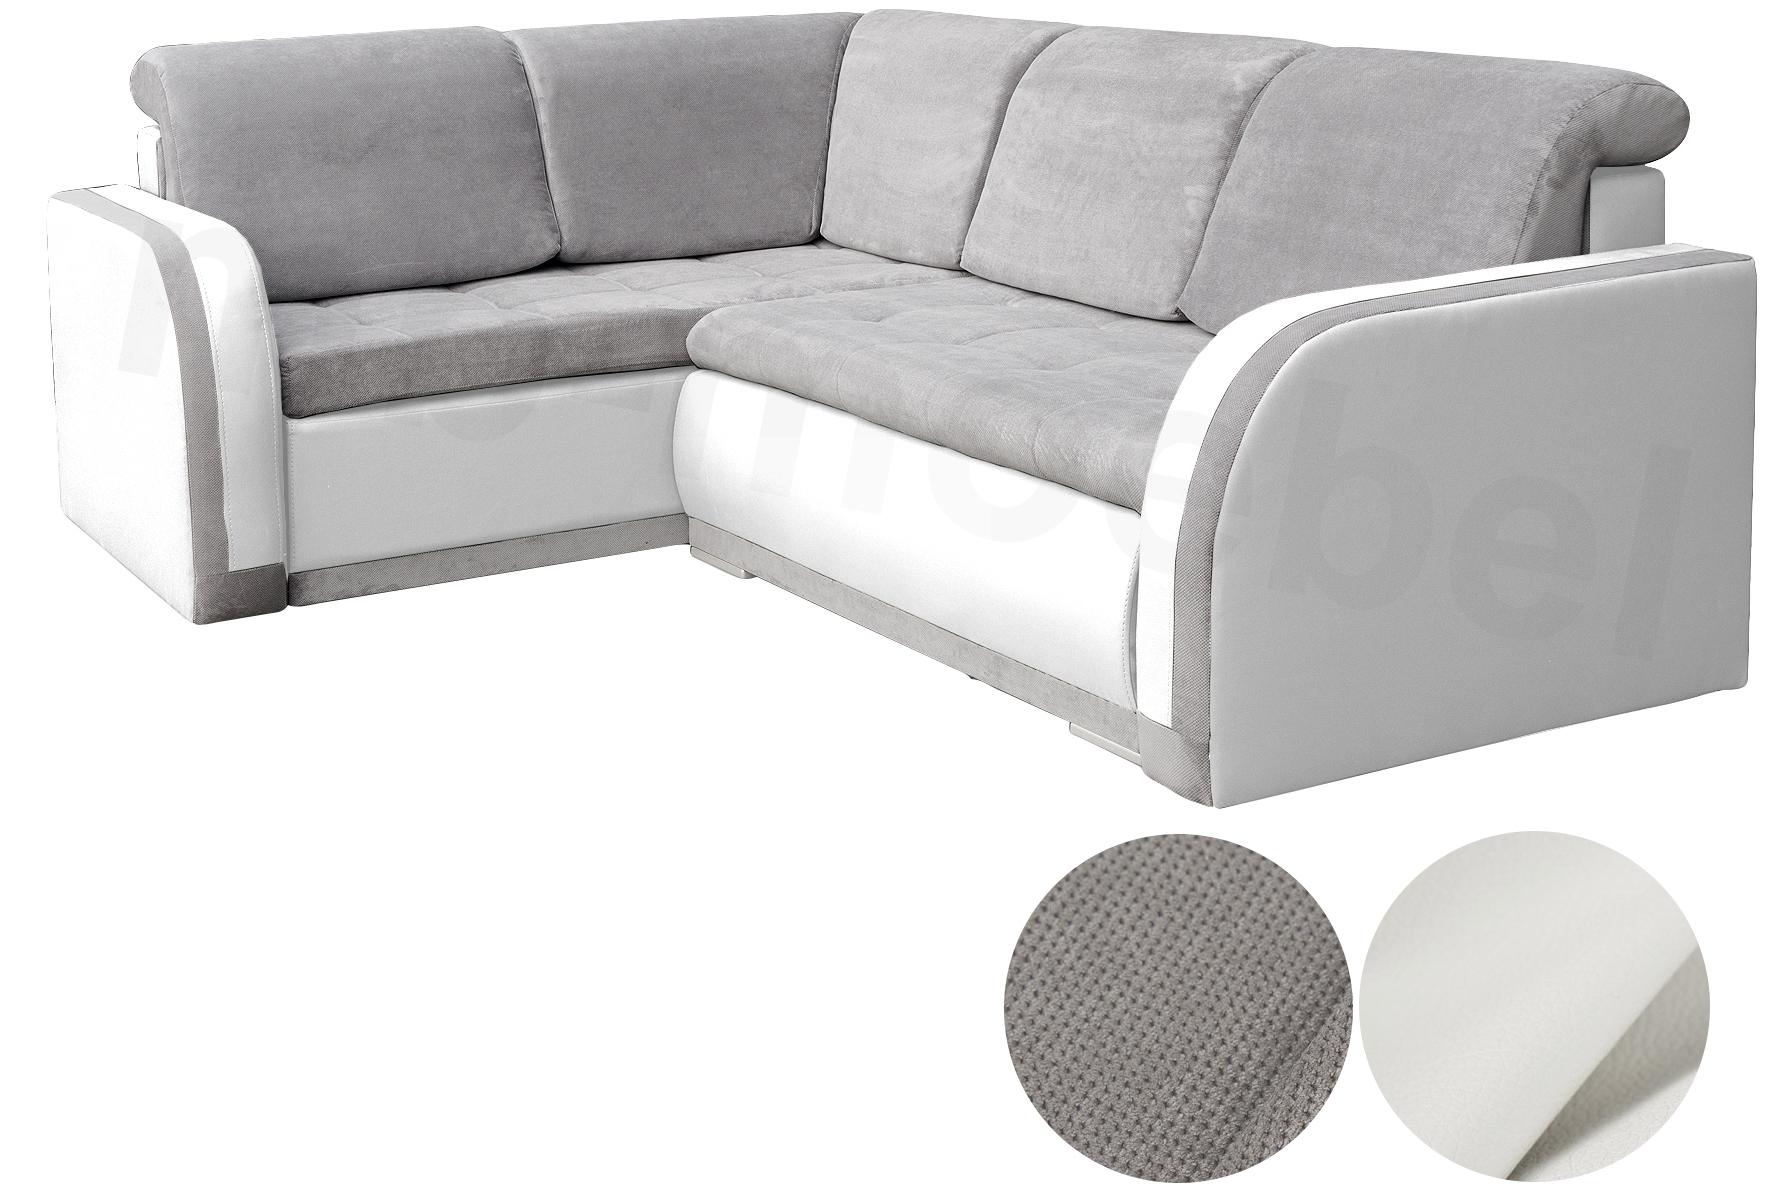 Kleine Couch Grau Eckcouch Grau